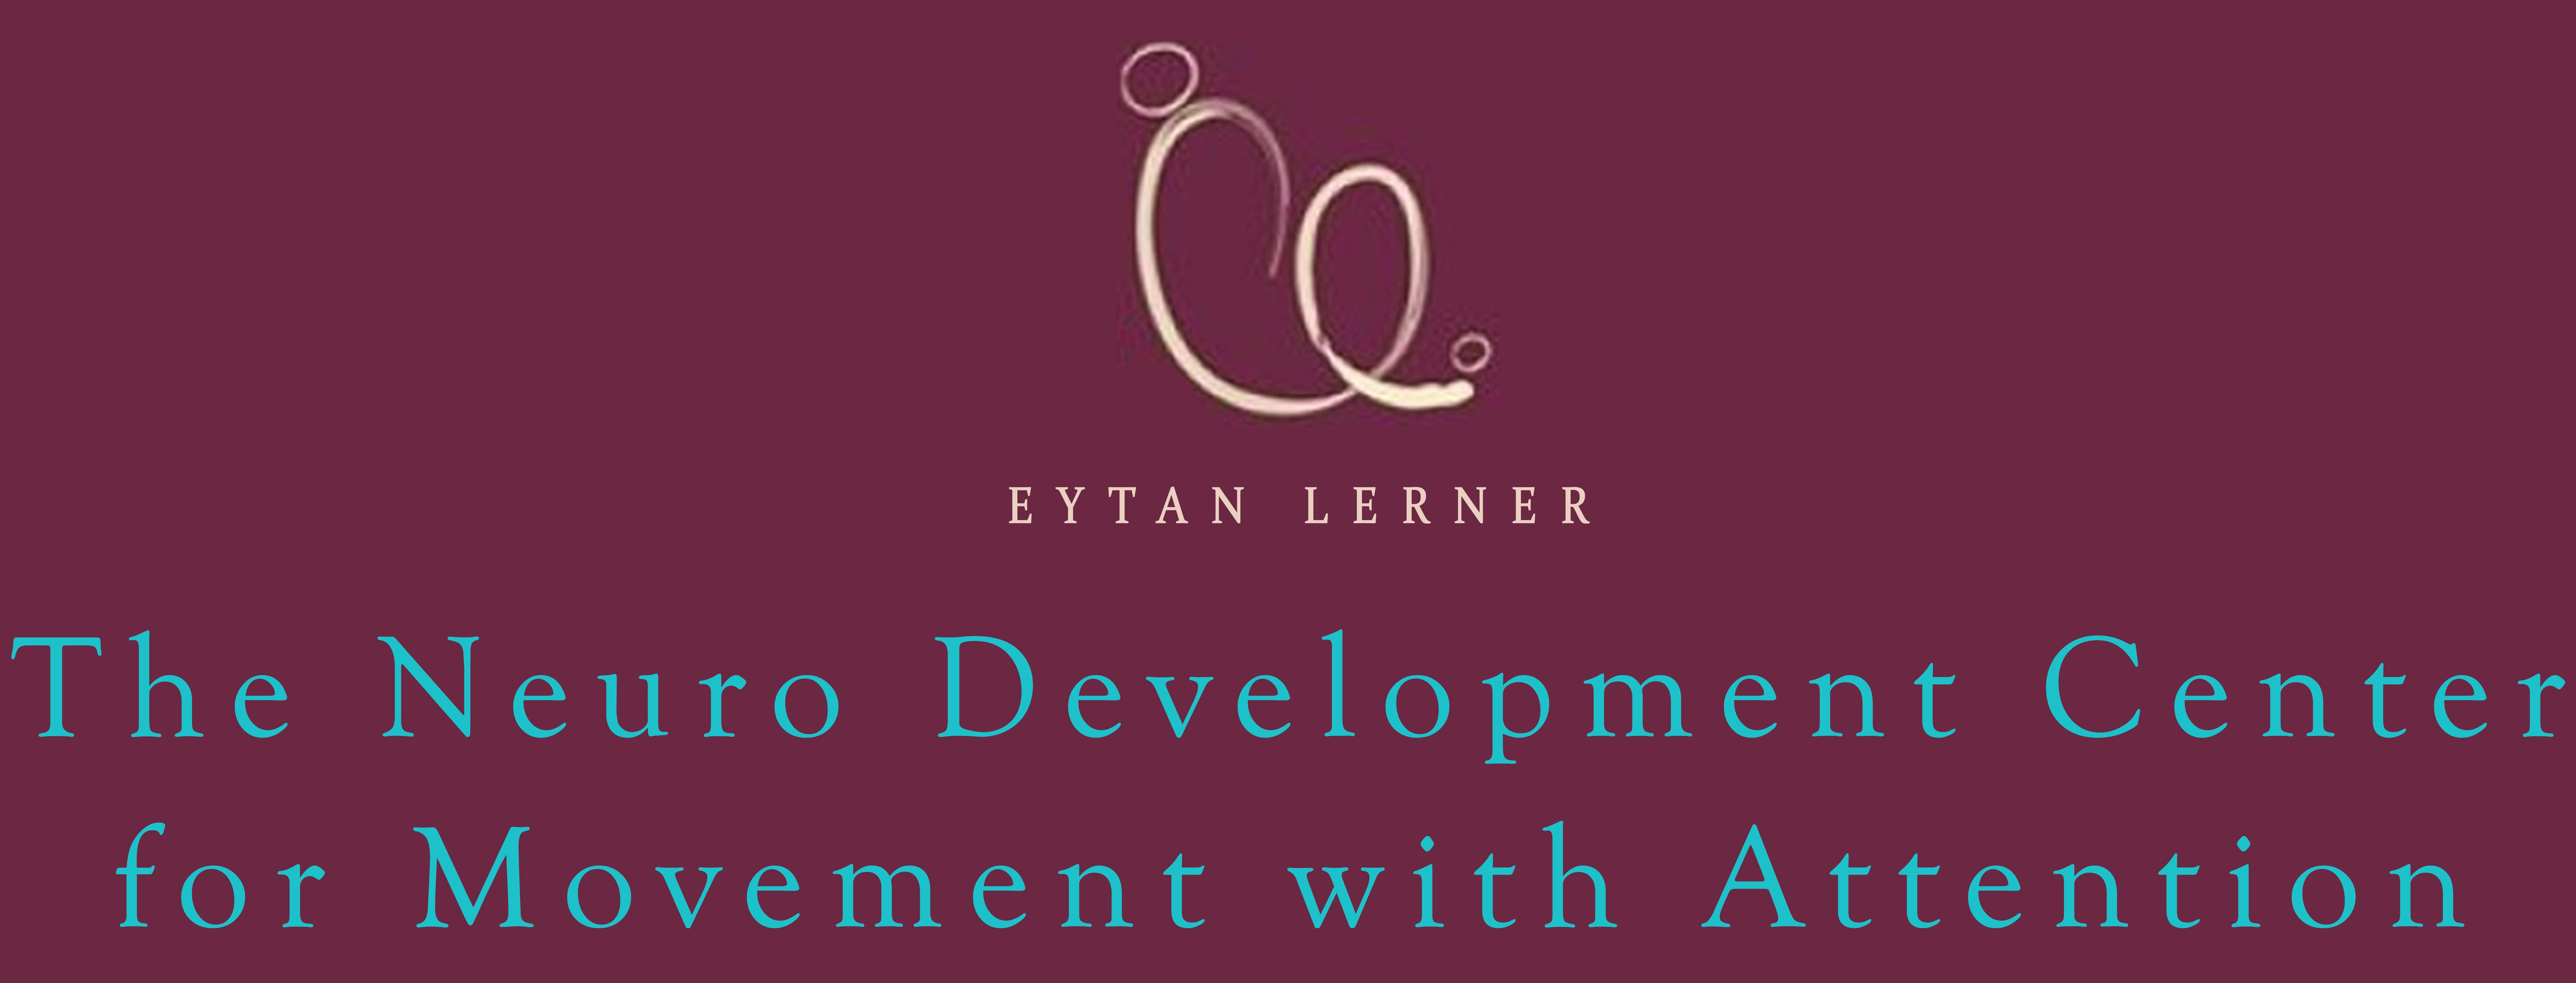 Eytan Lerner